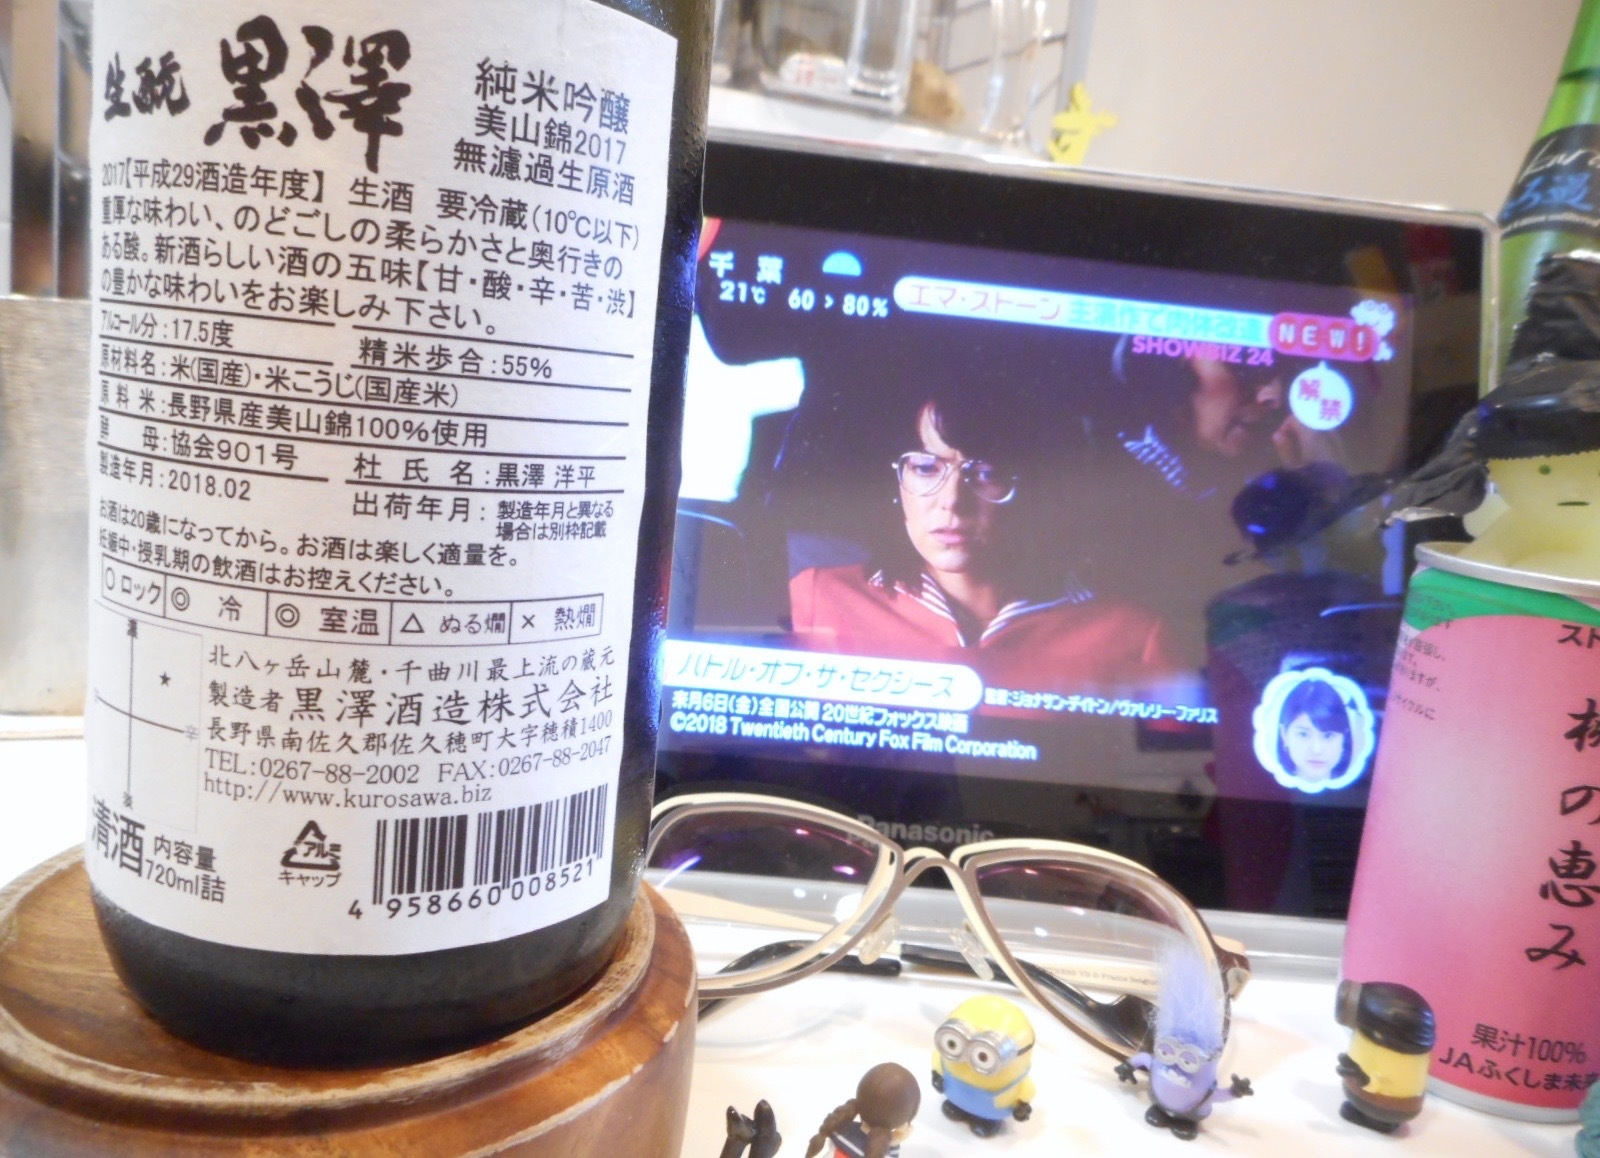 kurosawa2017jungin2.jpg